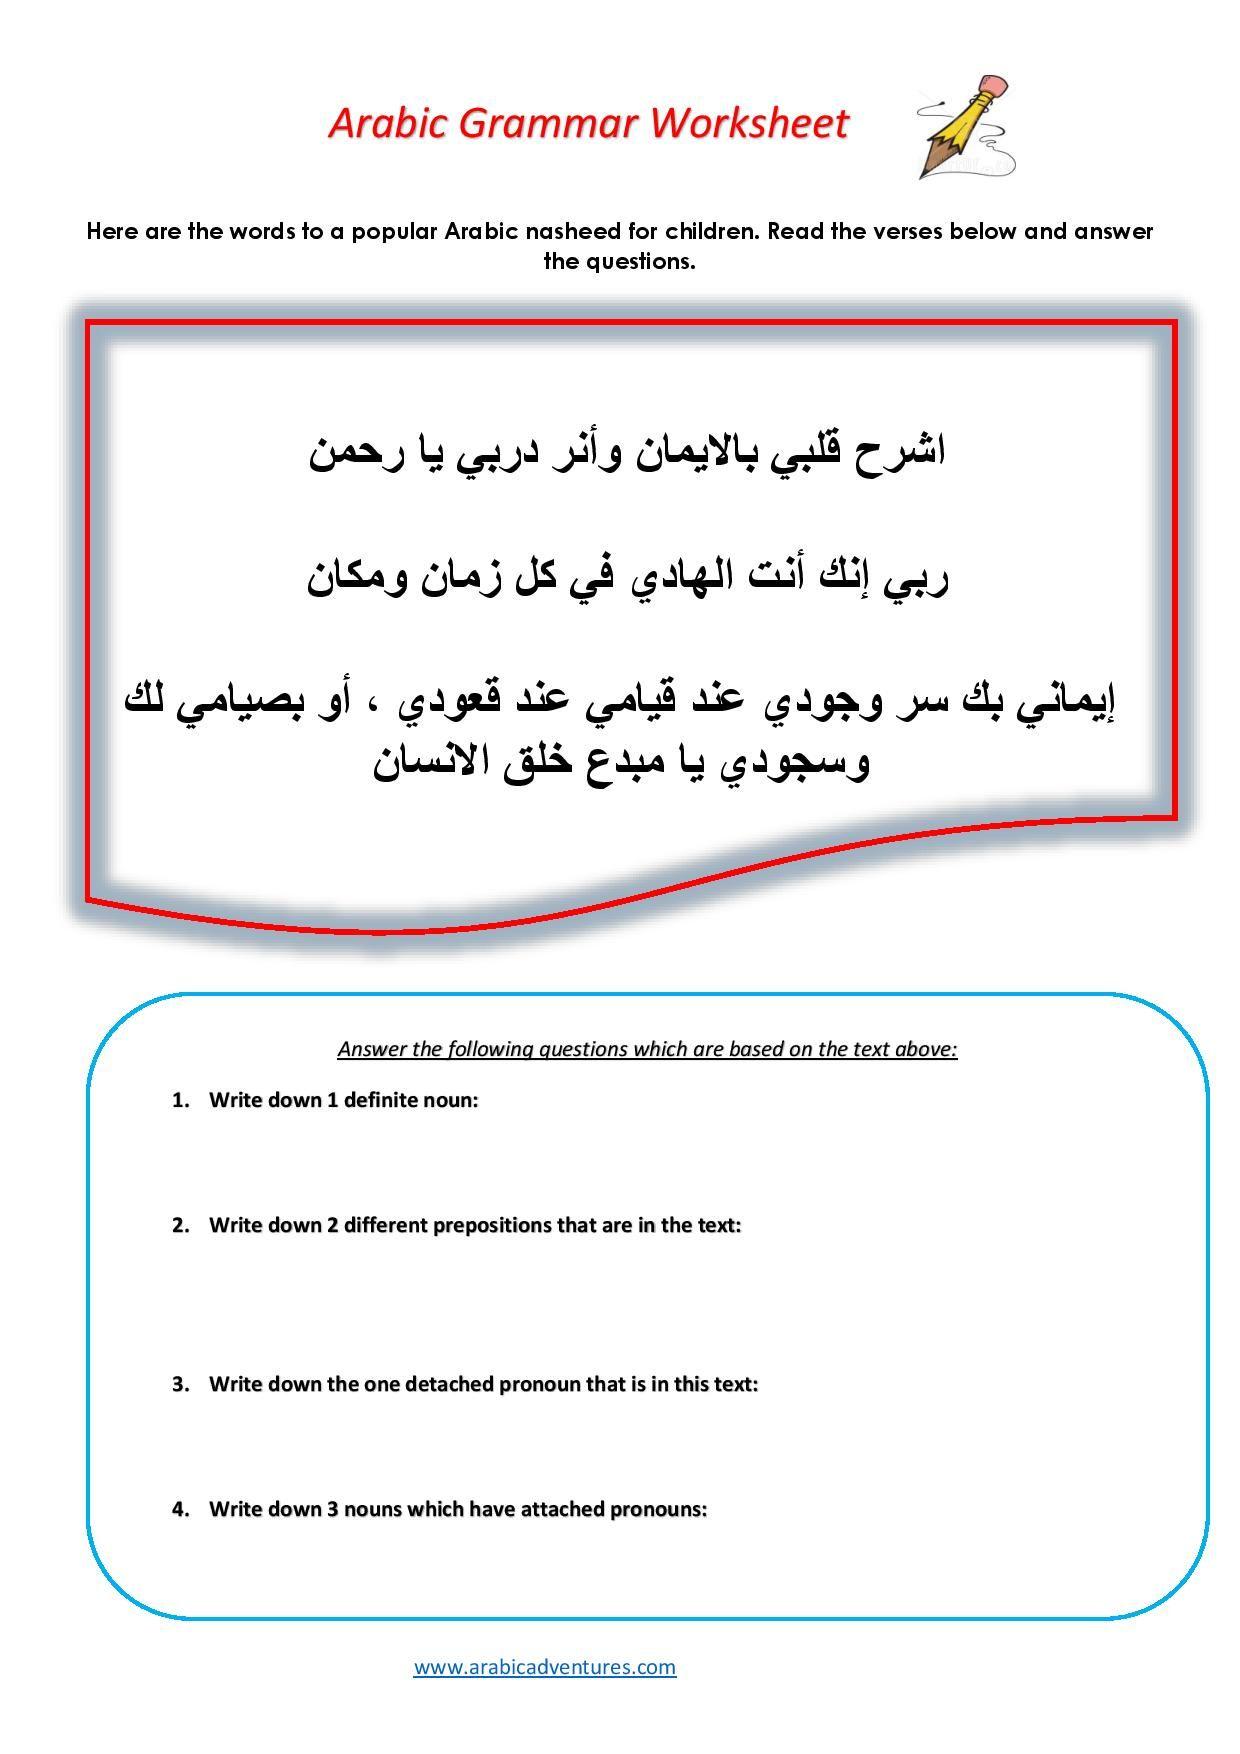 Arabic Grammar Review Worksheet Using A Popular Nasheed